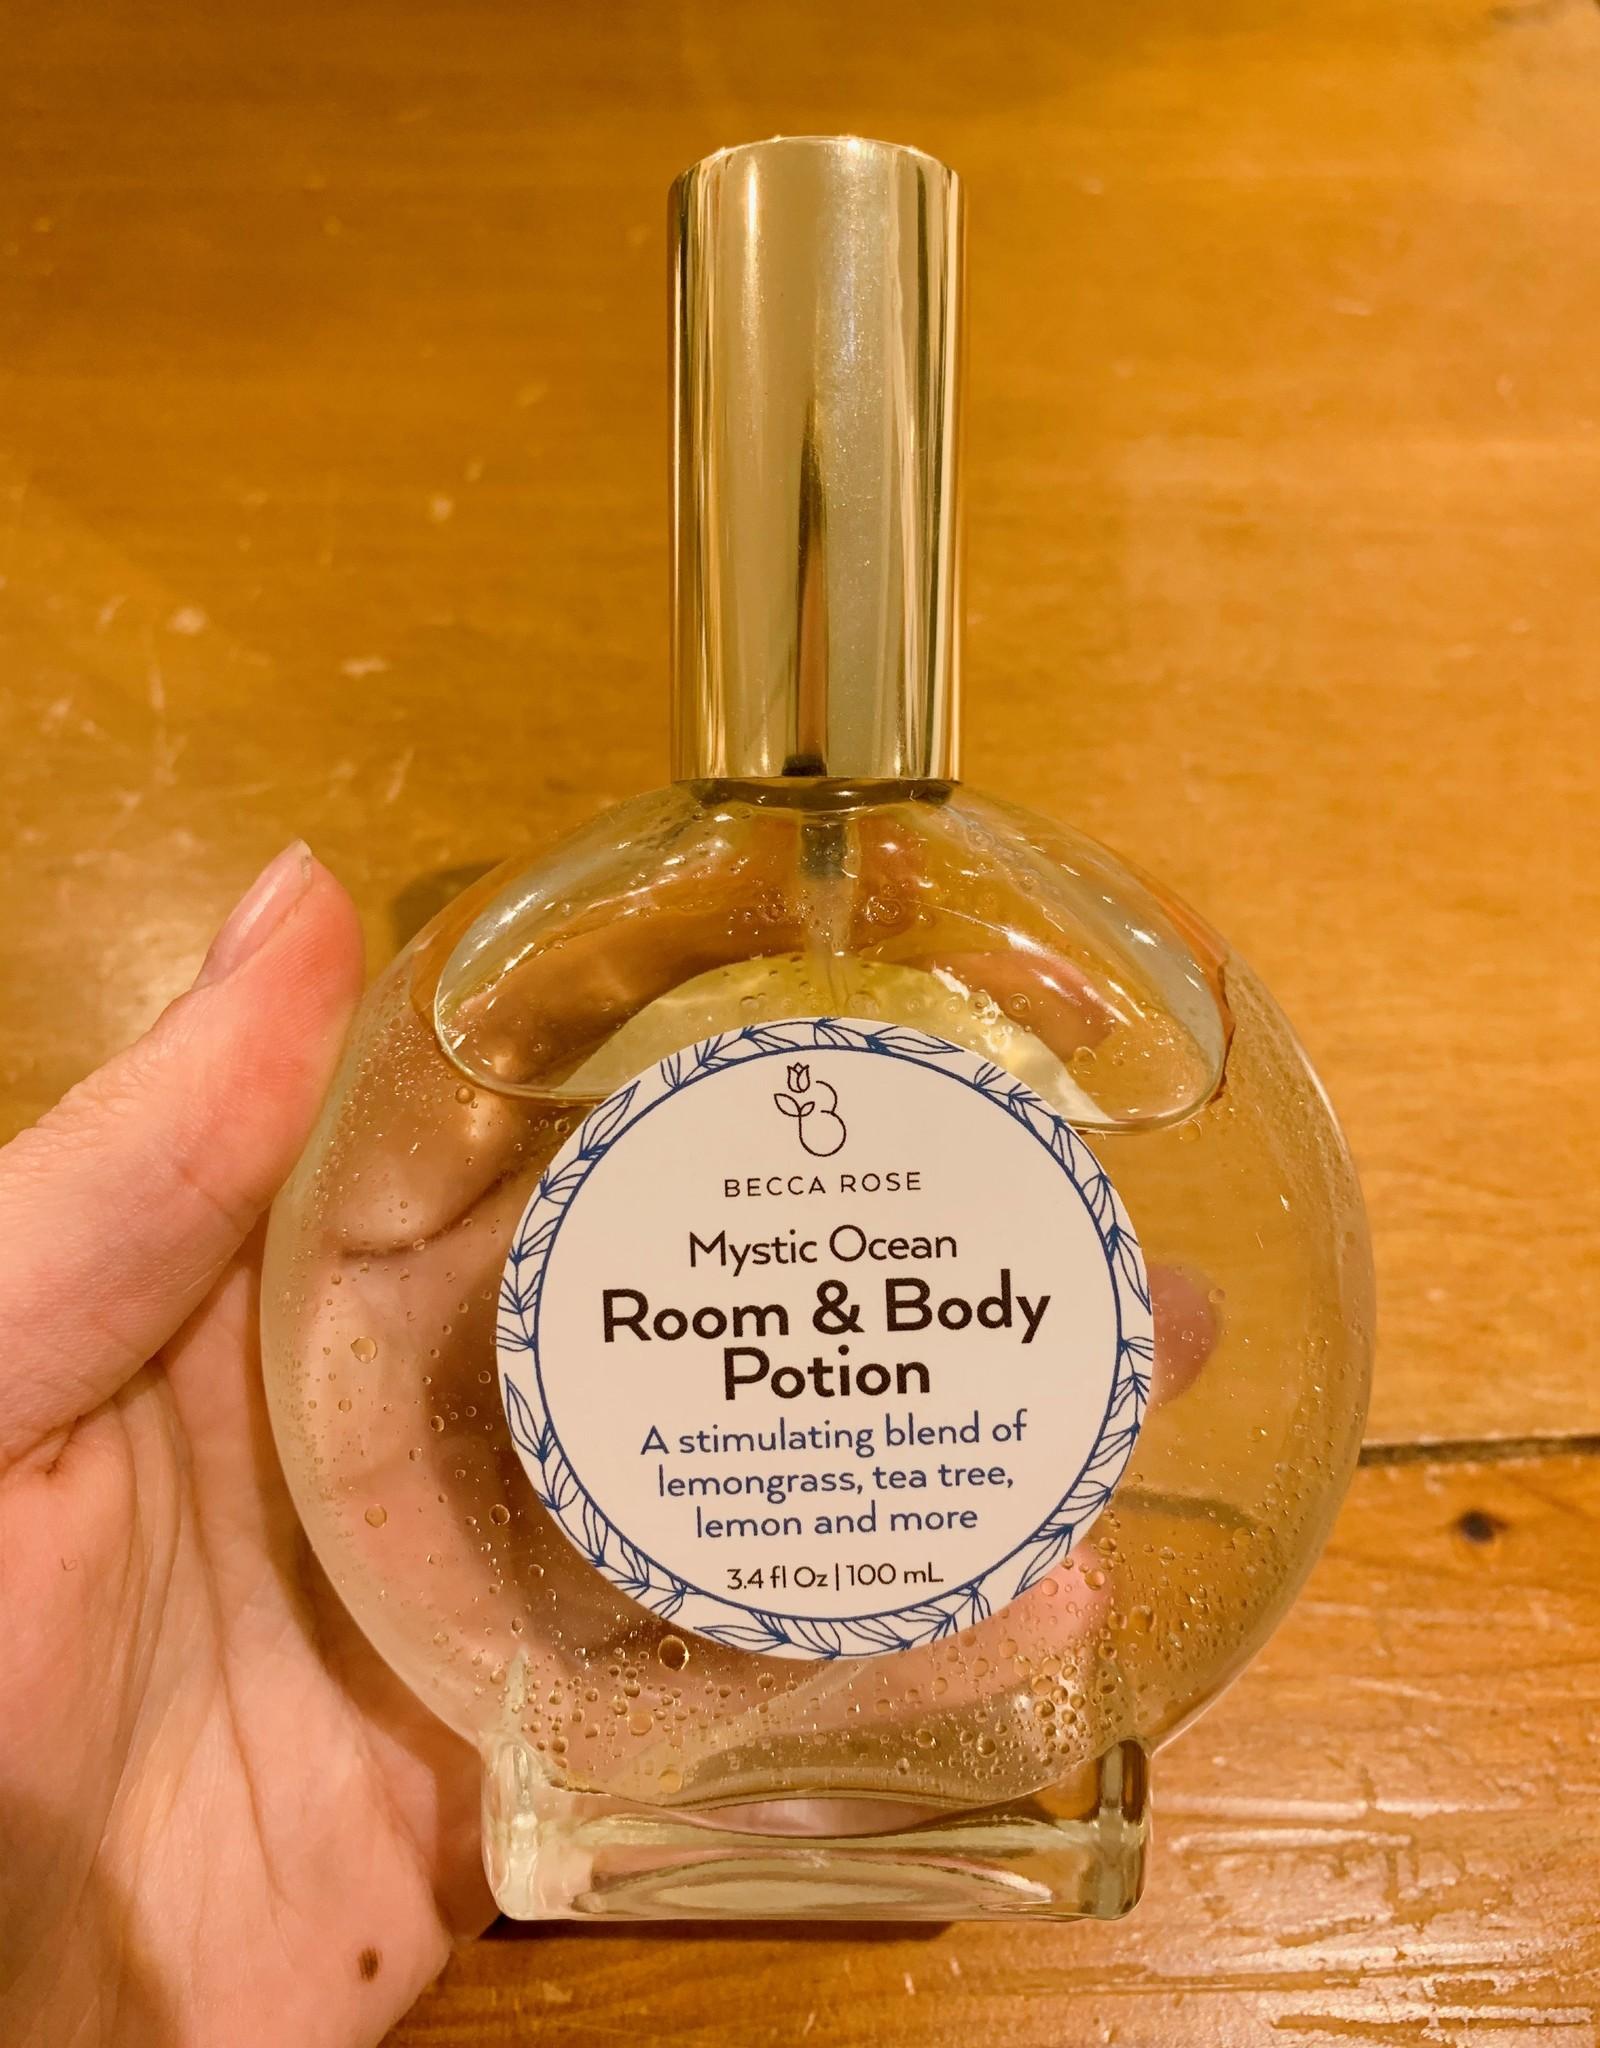 Becca Rose Mystic Ocean Room & Body Potion